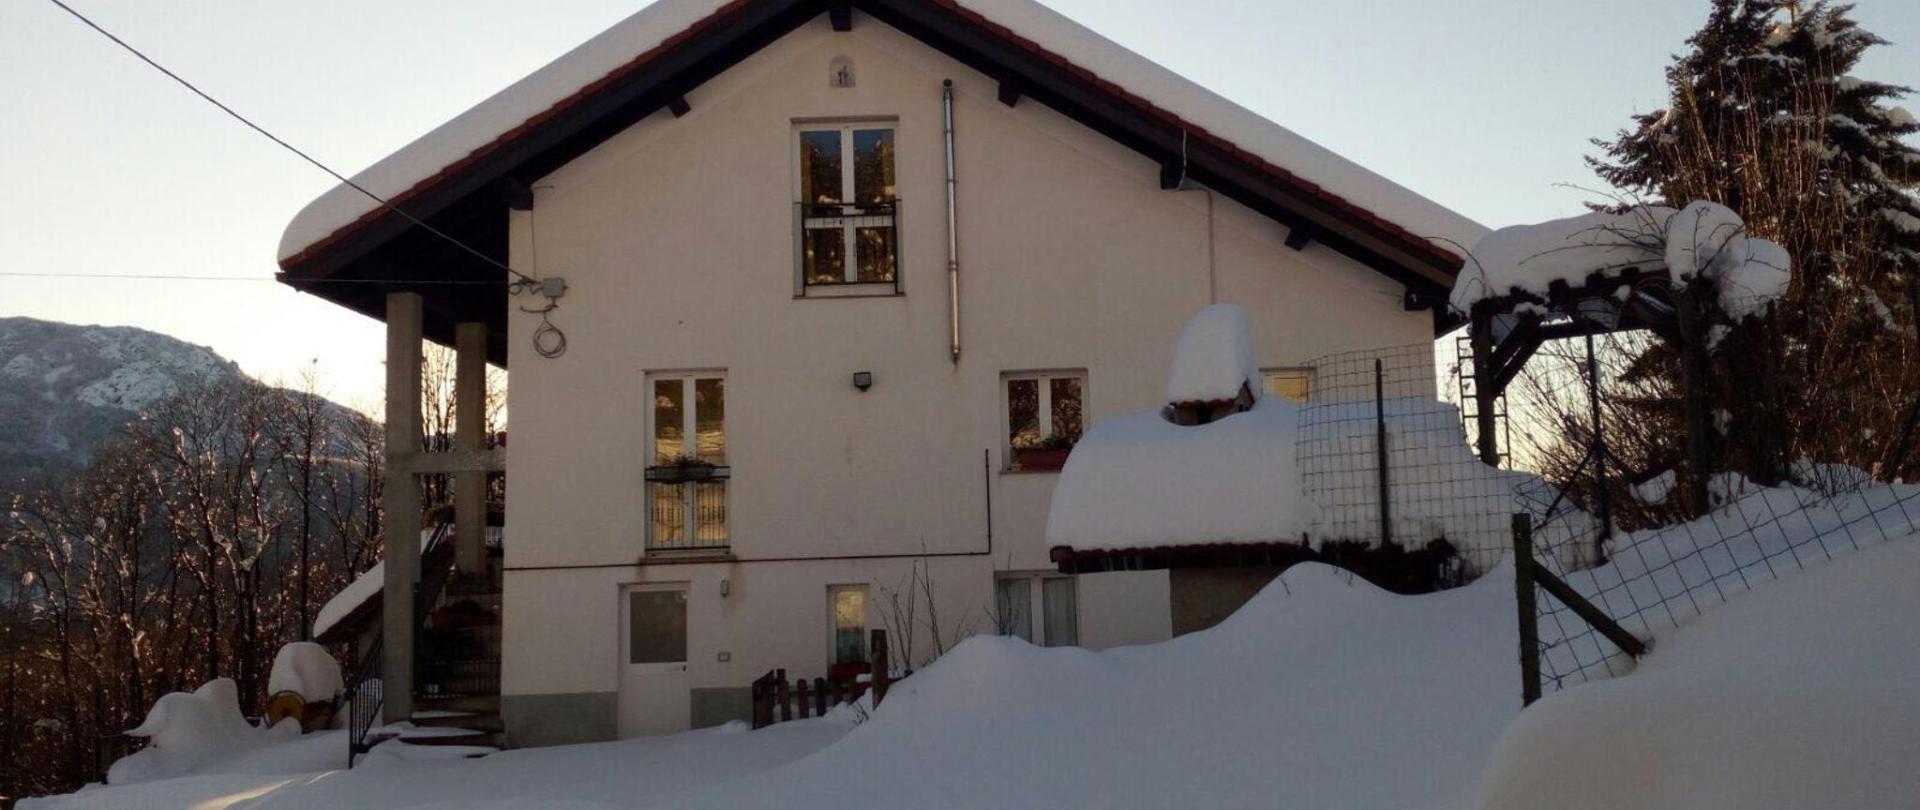 2018-02-07-LCI winter 01.jpg